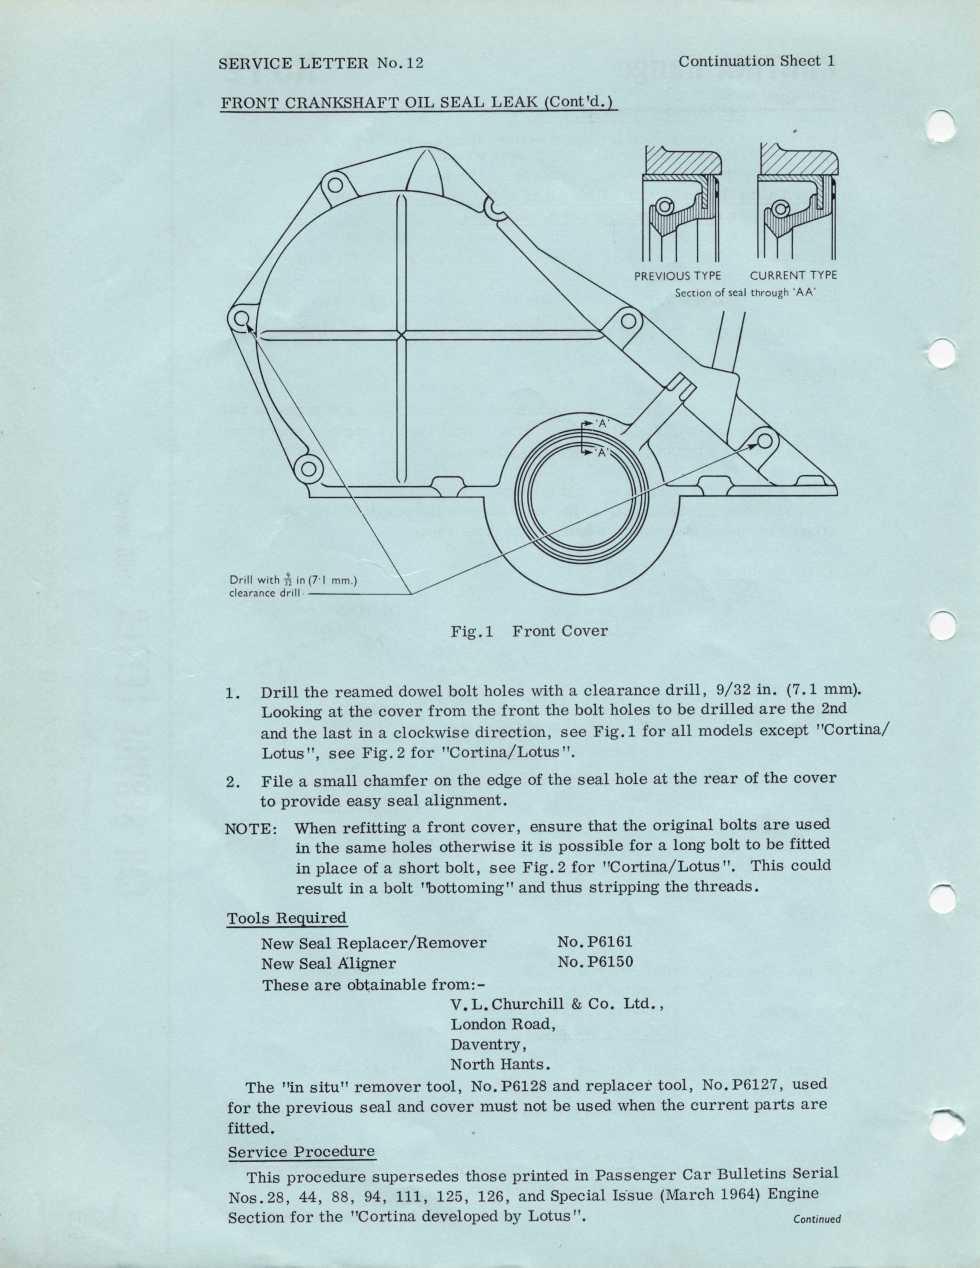 80-change-service-front-crankshaft-oil-seal-2